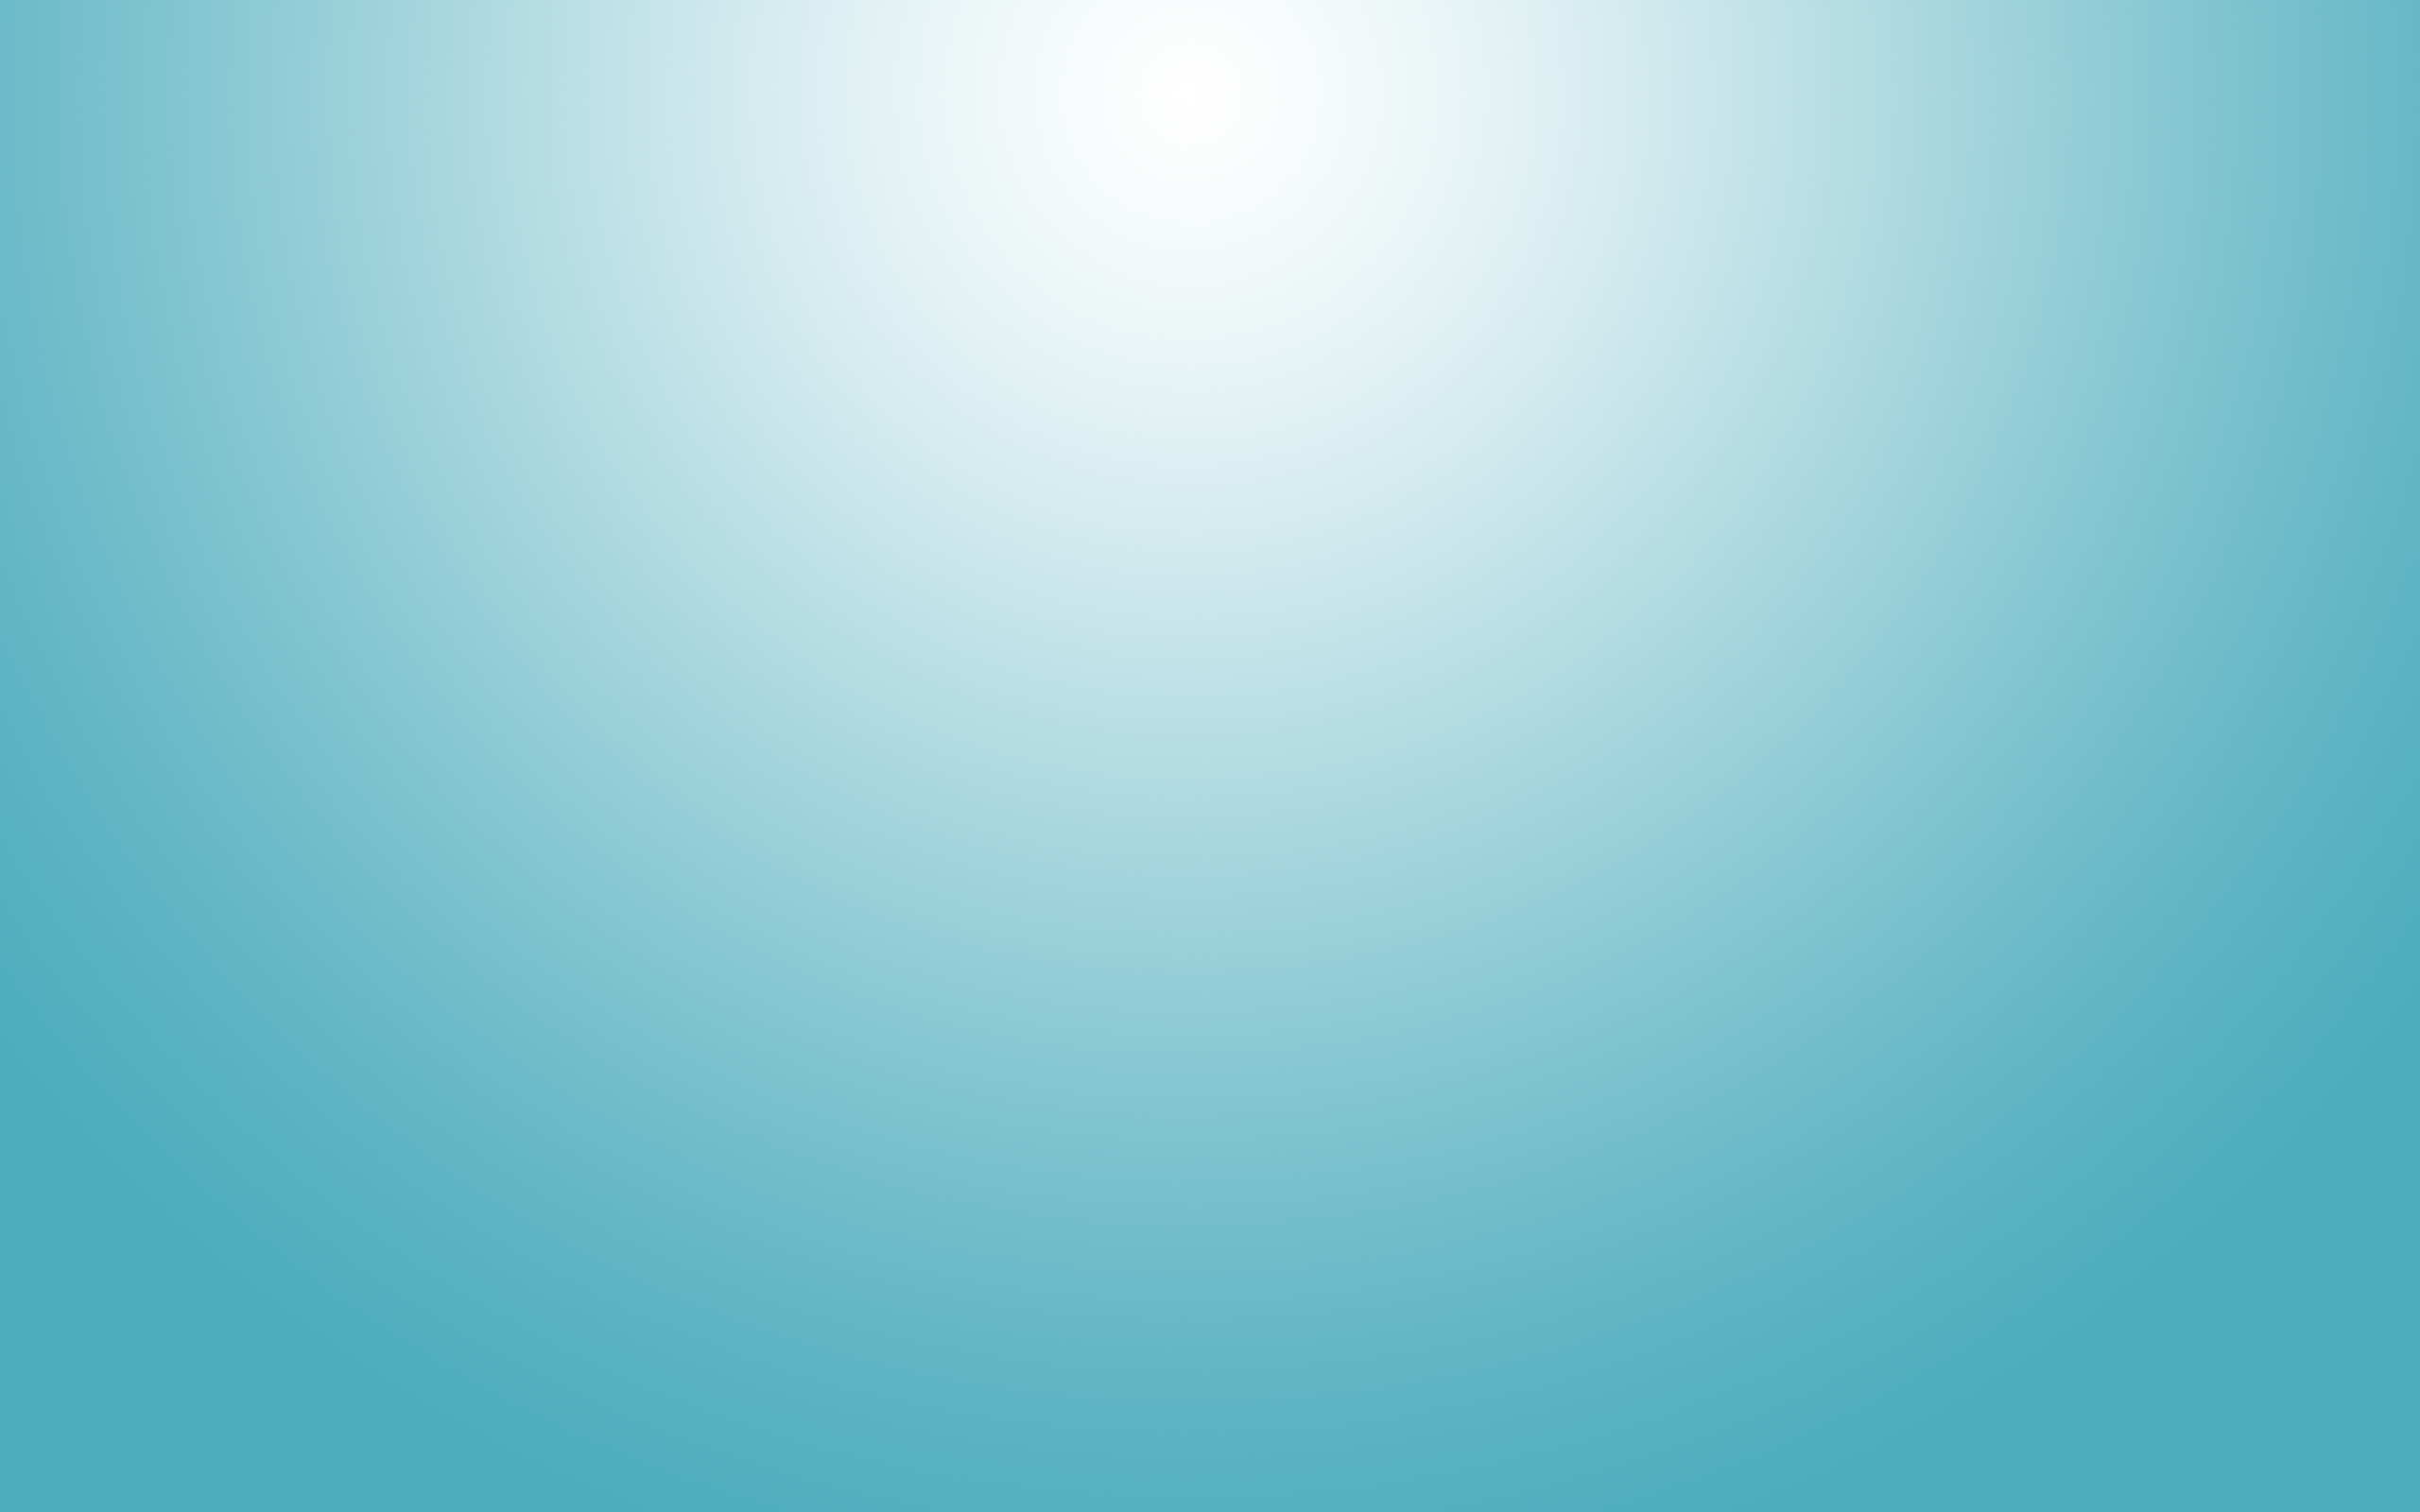 15 Excellent HD Gradient Wallpapers - HDWallSource com